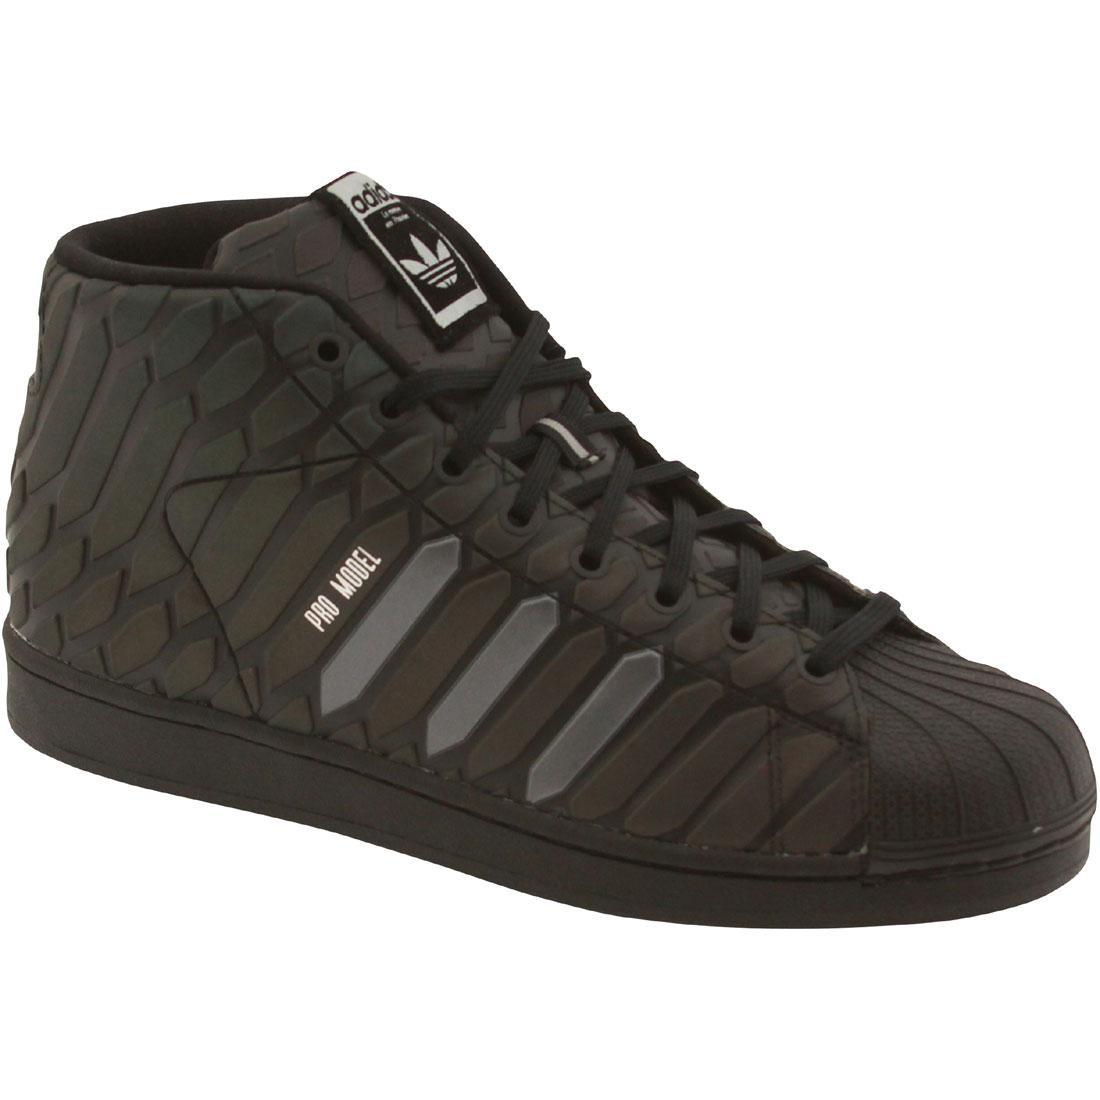 Adidas Men Pro Model - Xeno Reflective (black / supplier colour / running  white)